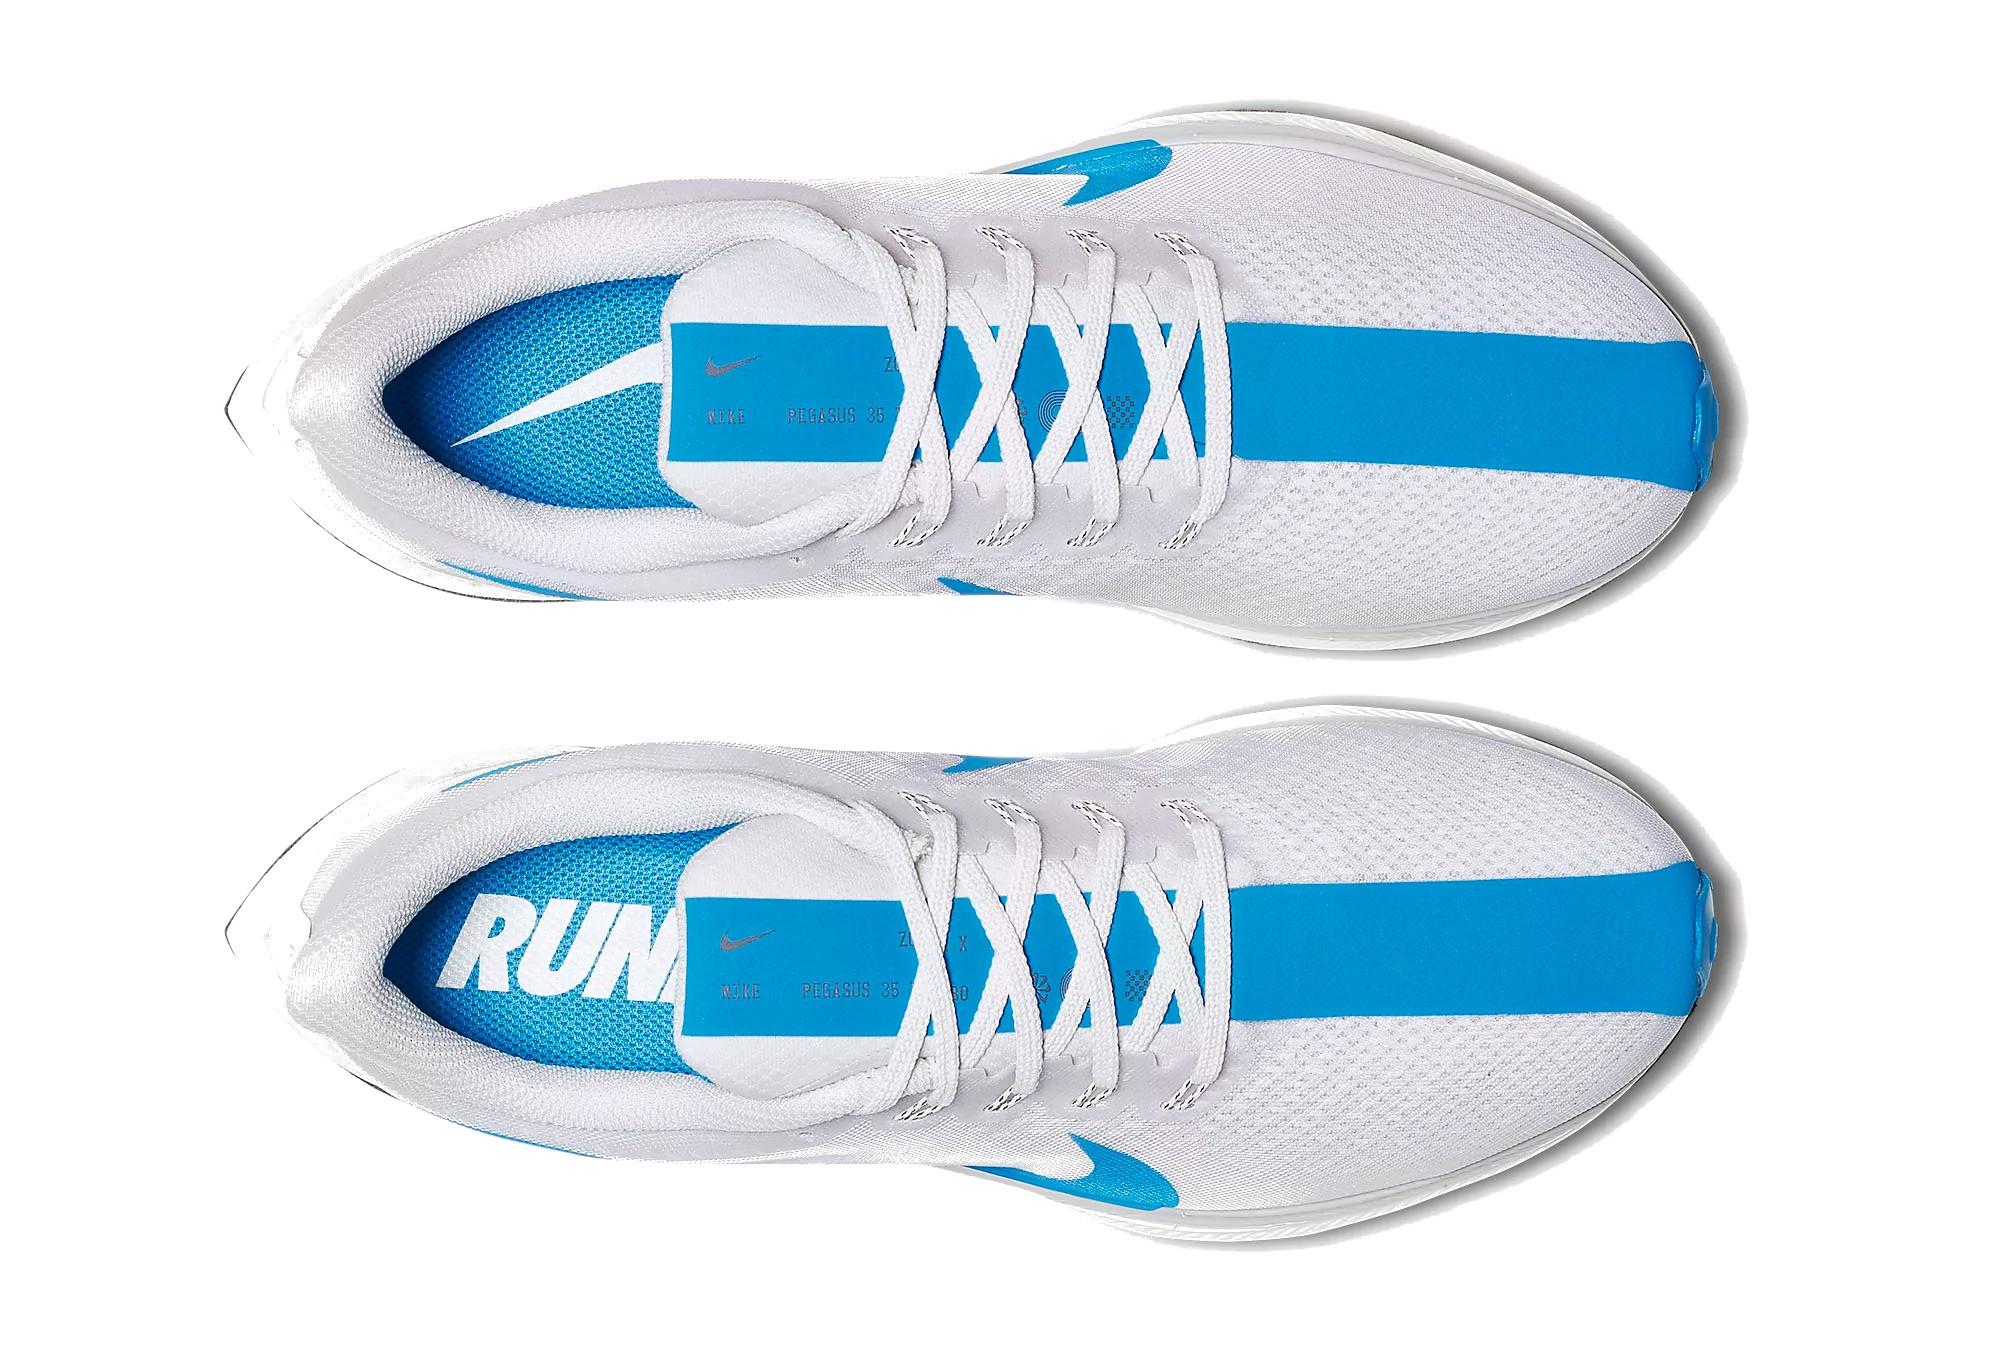 vente chaude en ligne 04215 da934 Nike Shoes Zoom Pegasus Turbo White Blue Men